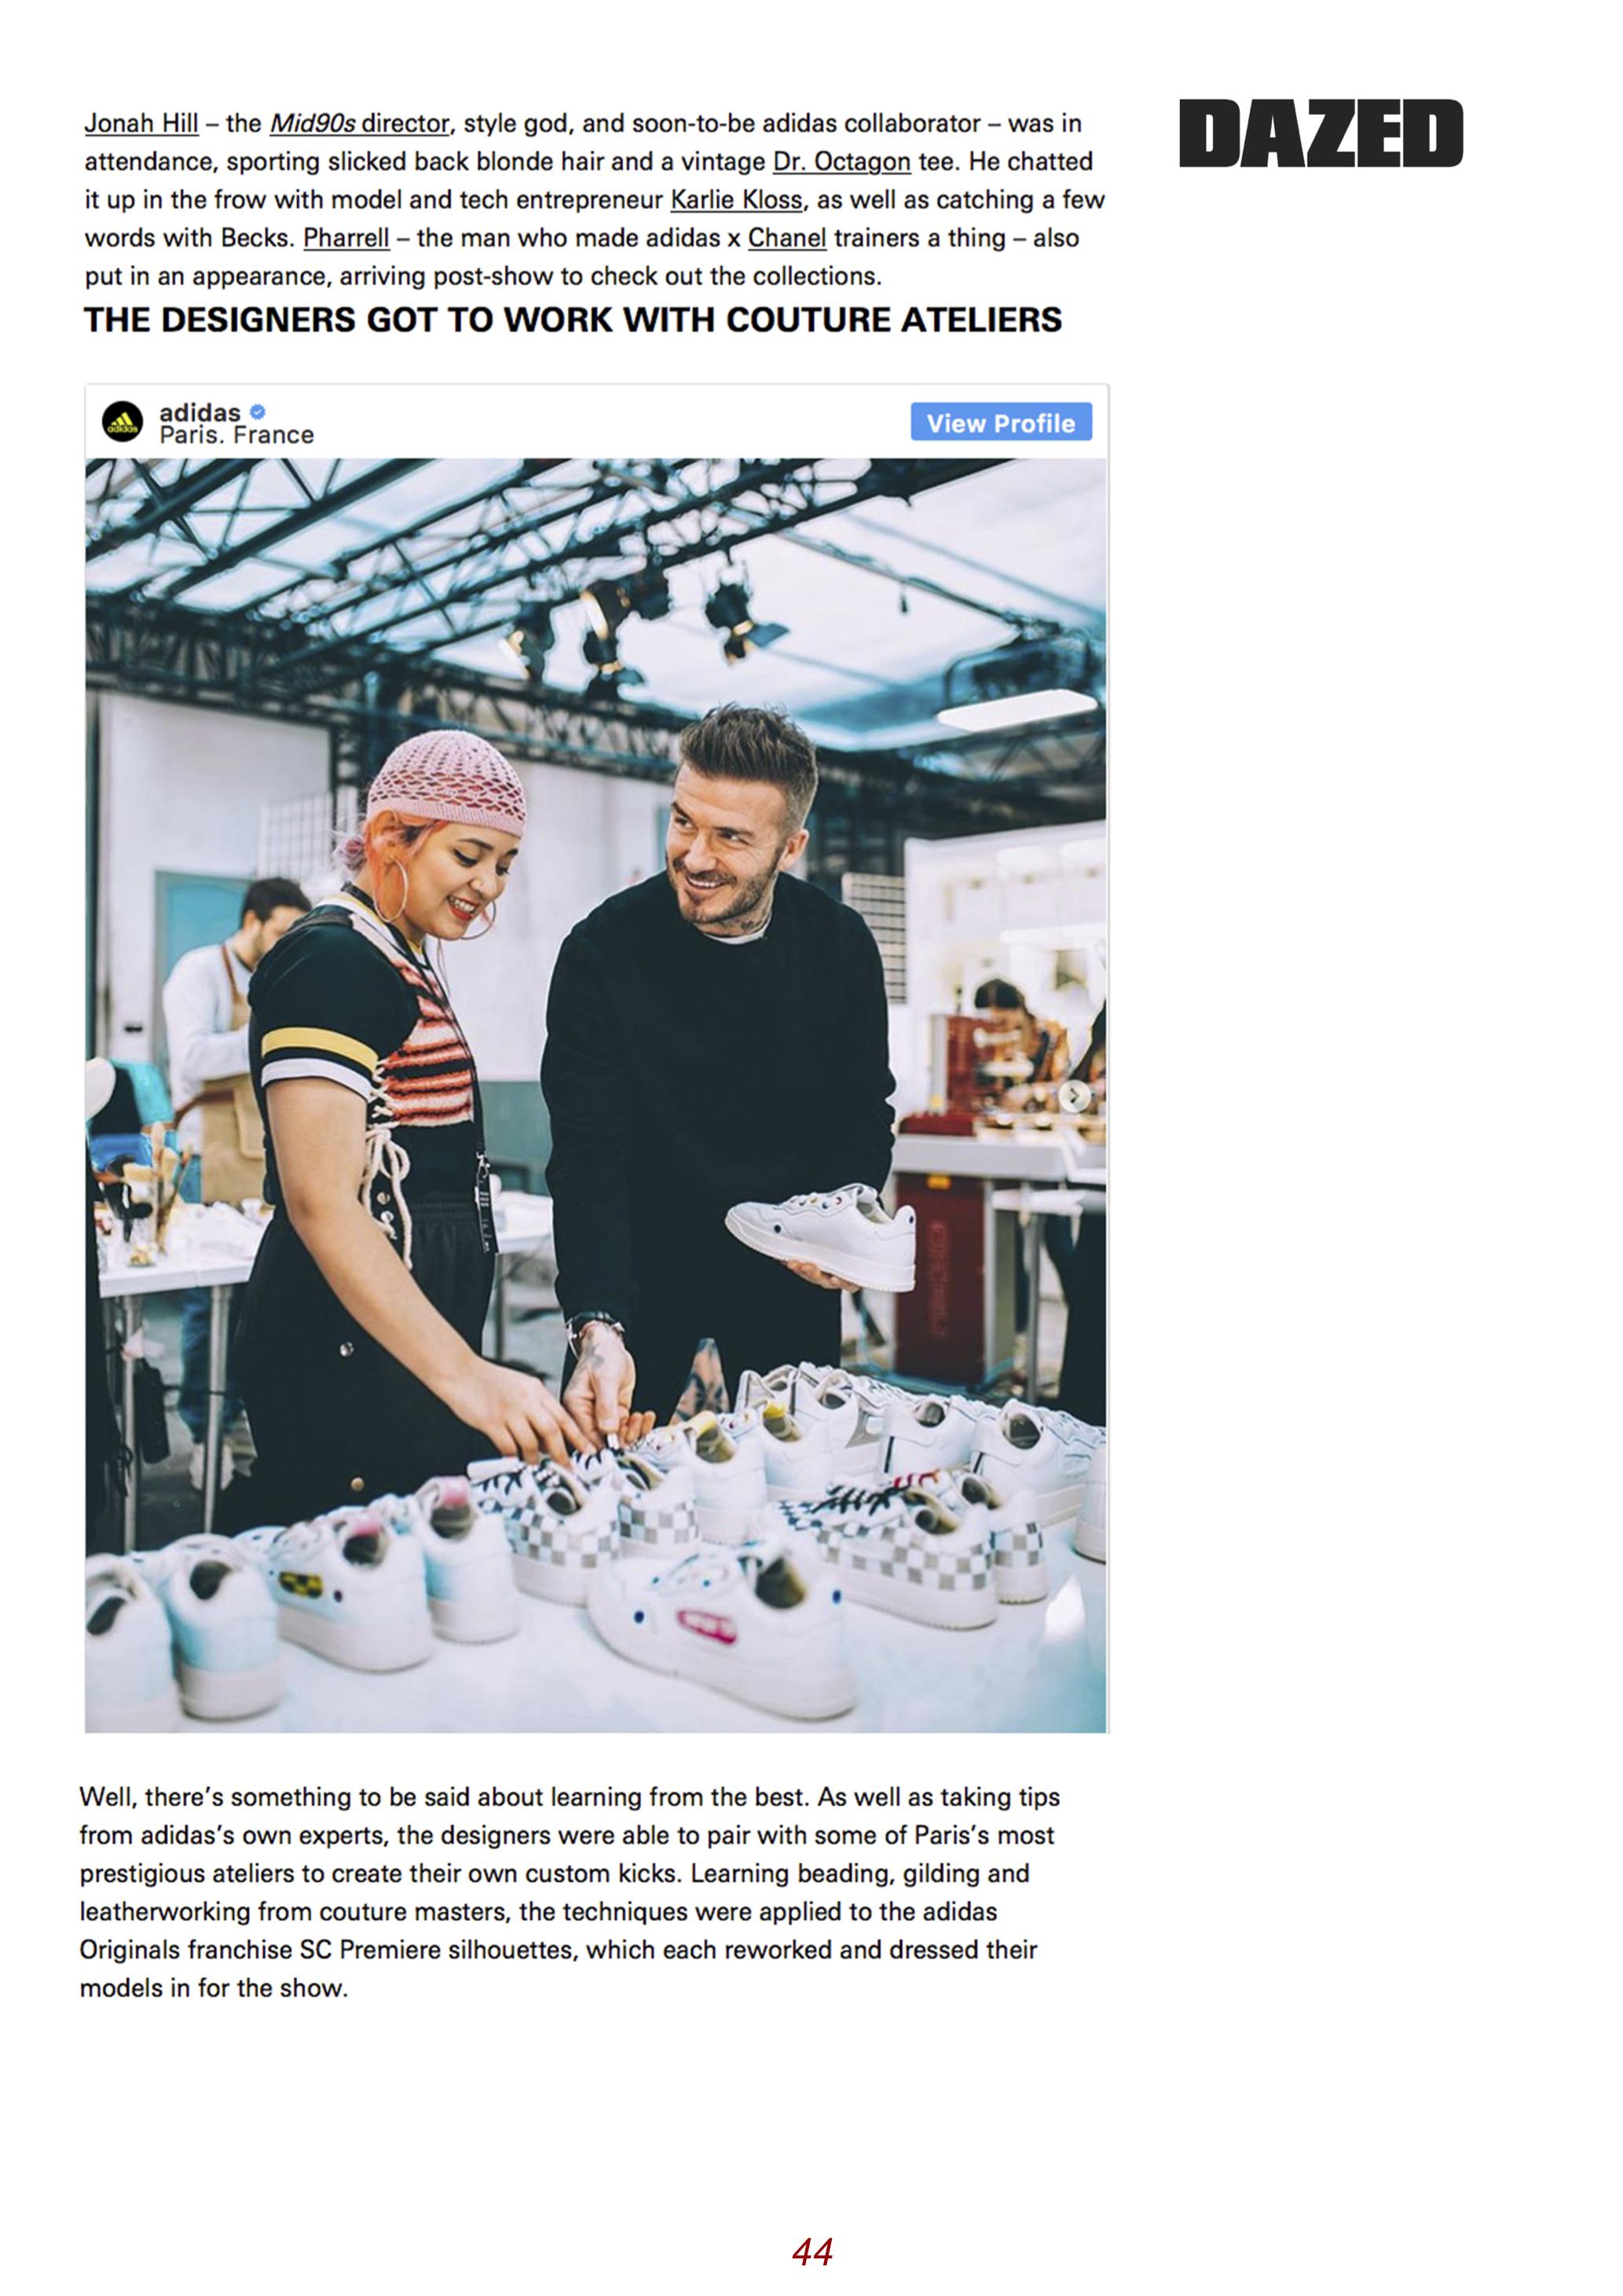 page 44 photo.jpg